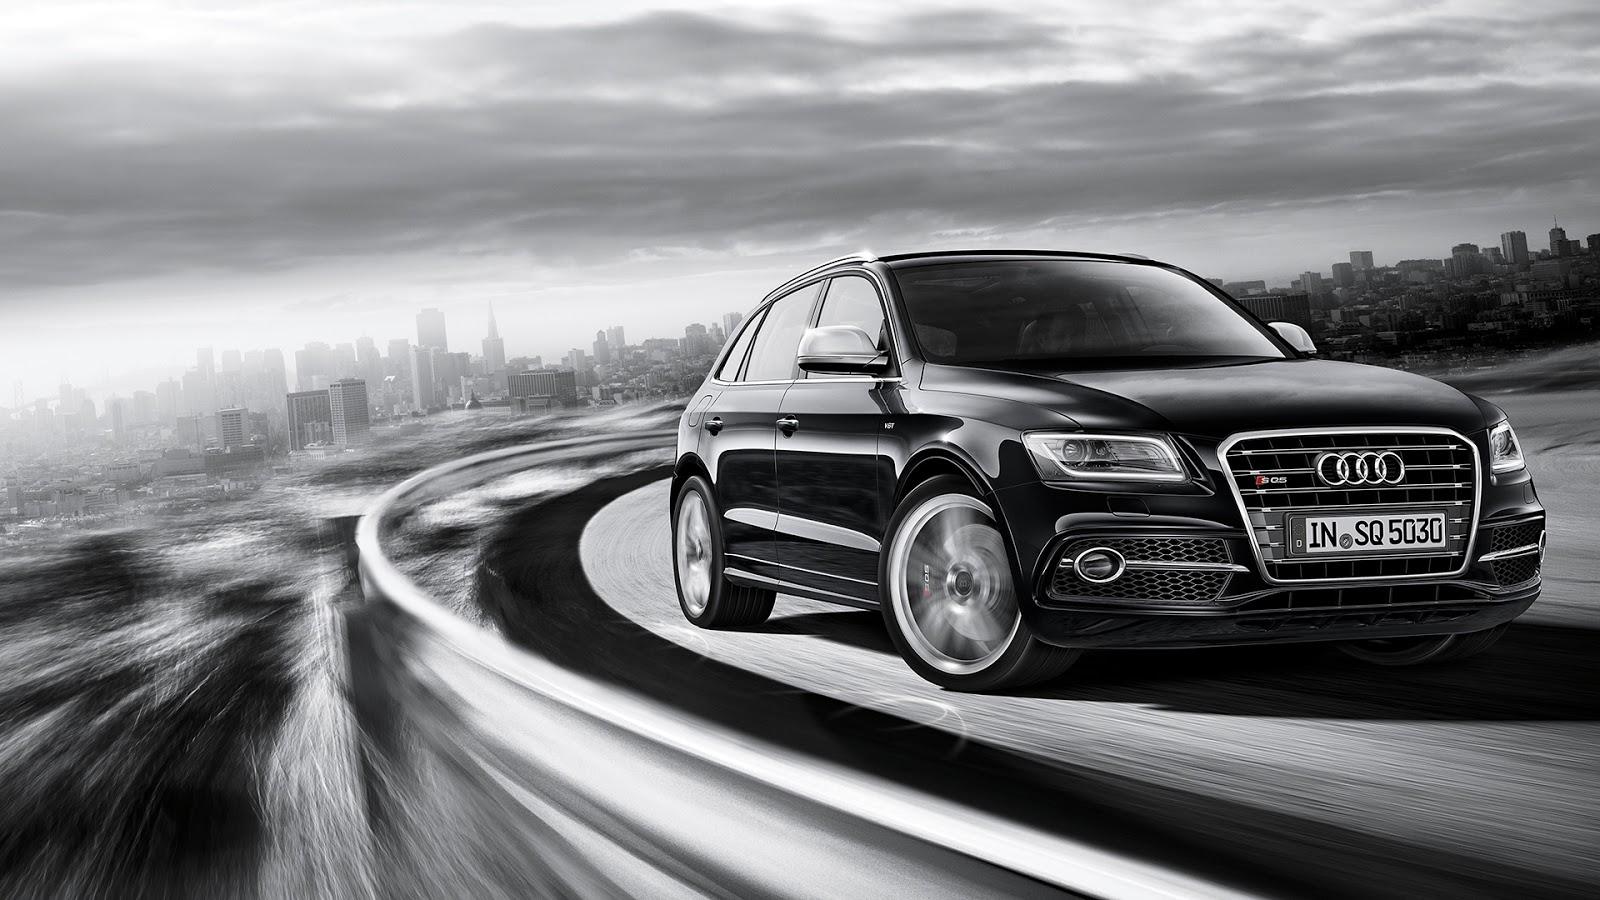 Audi SQ5 TDI competition